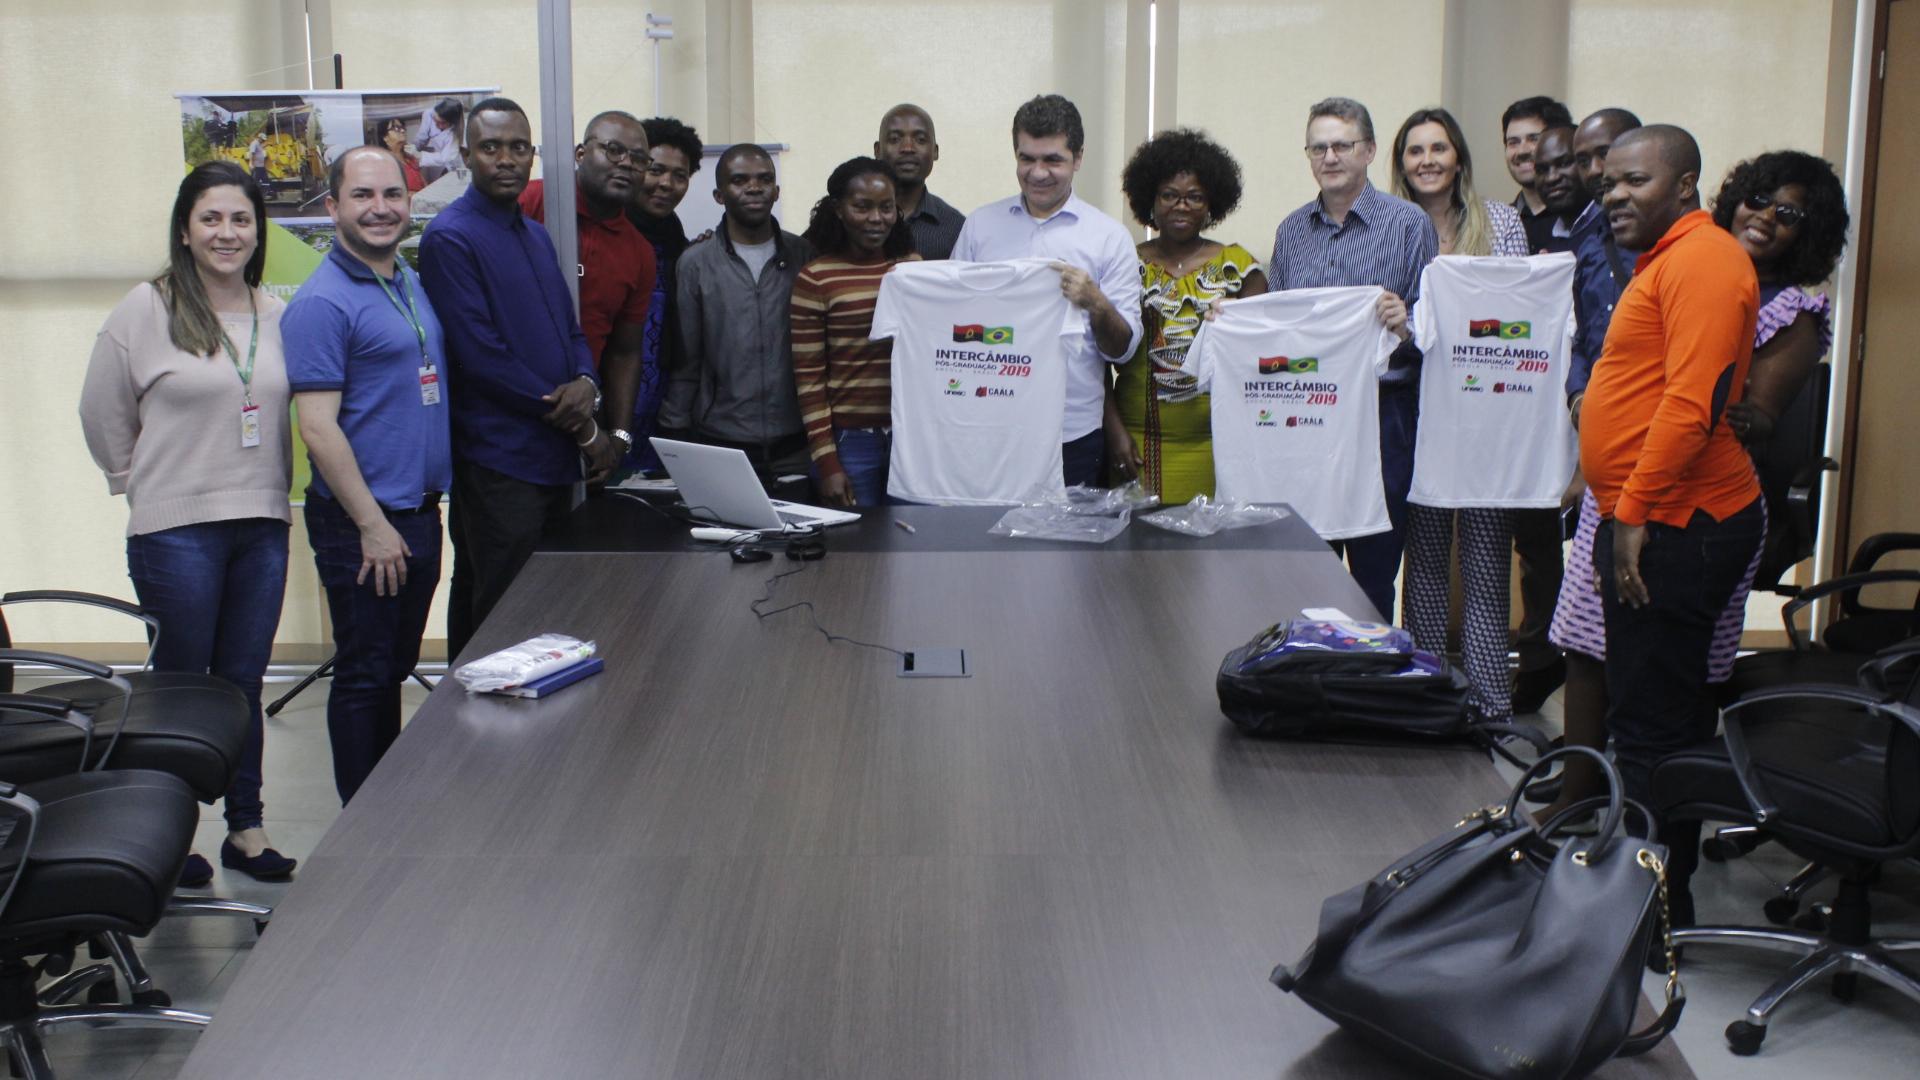 Estudantes angolanos realizam visita técnica na Prefeitura de Criciúma